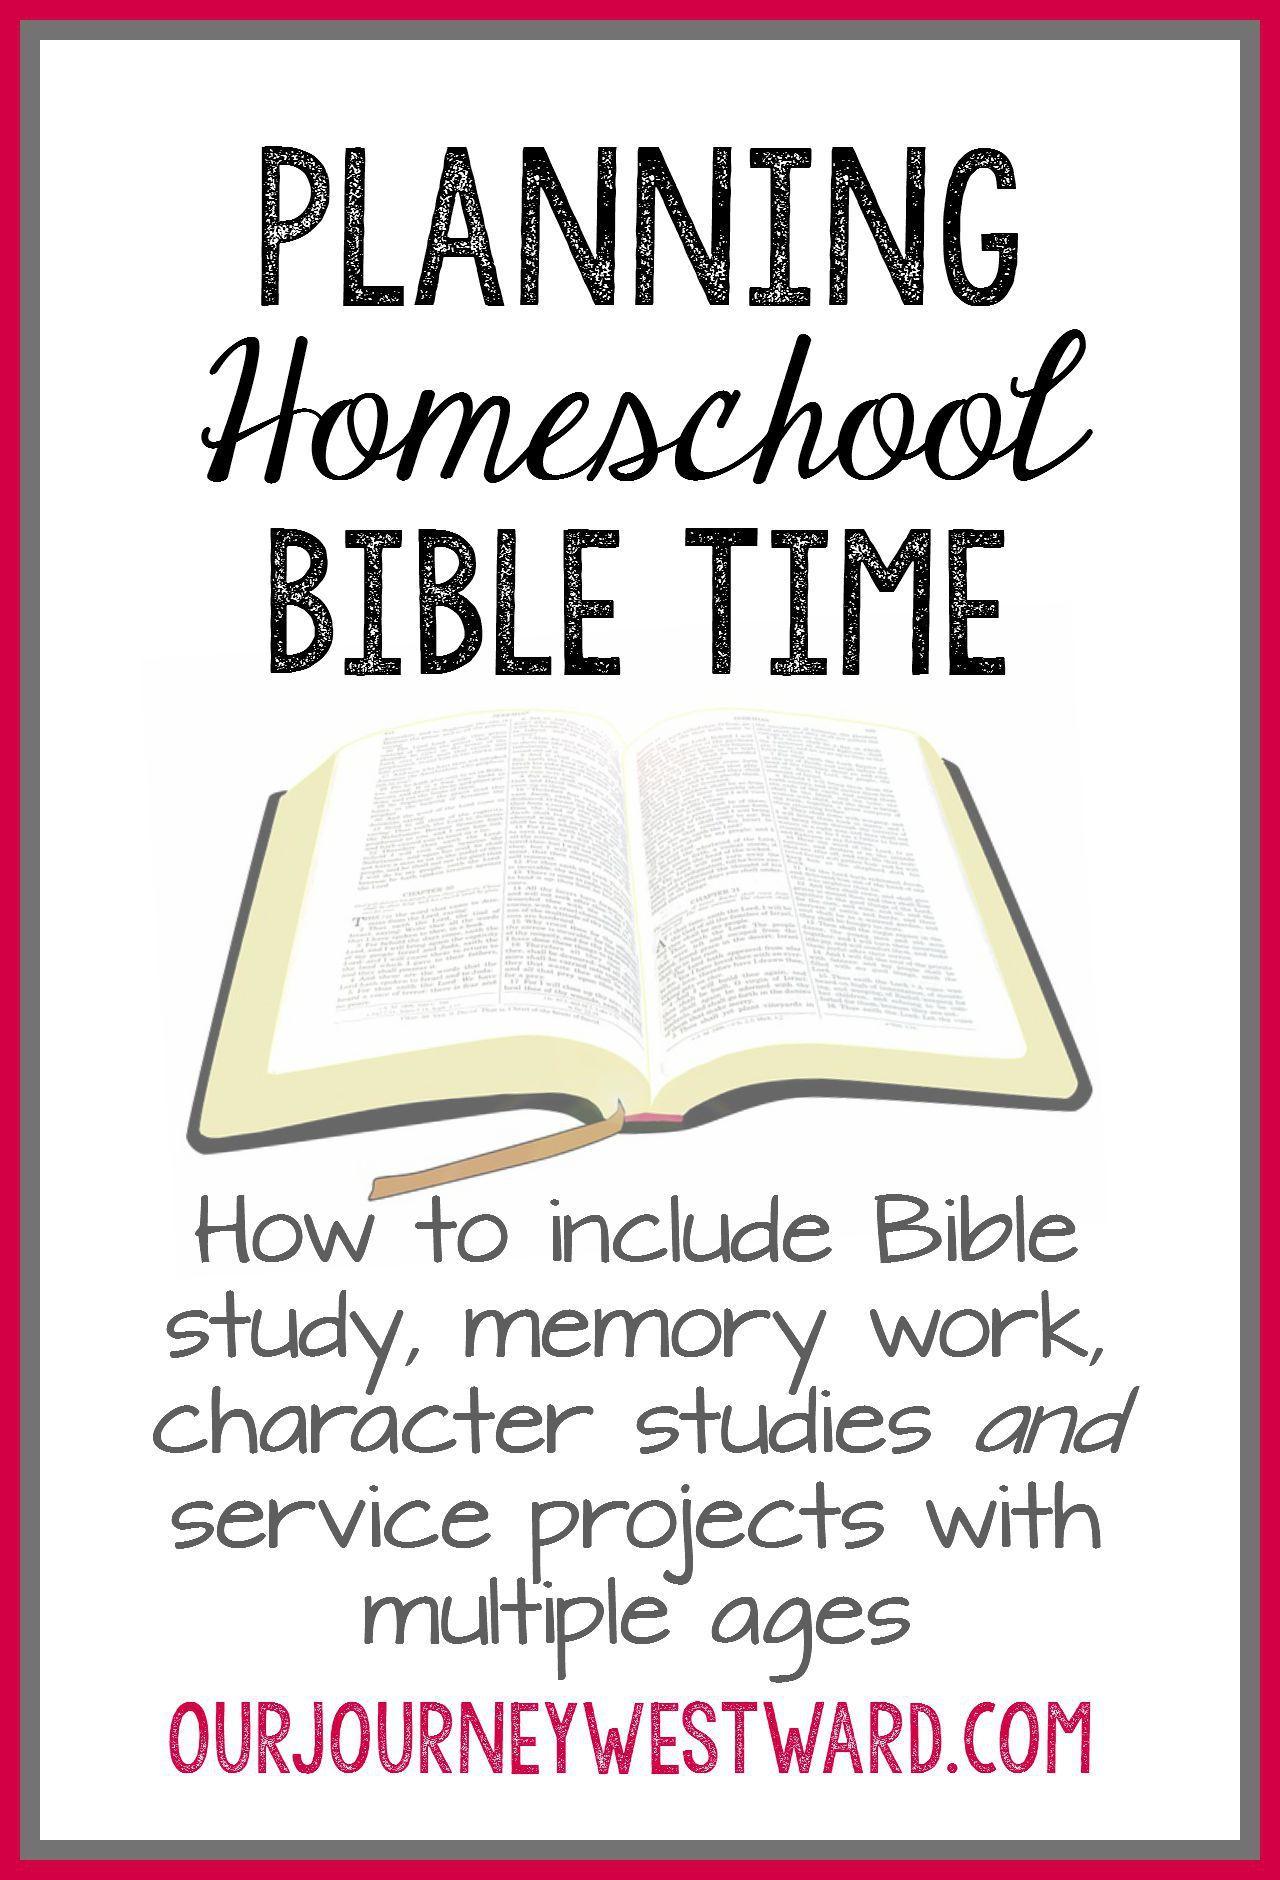 Planning Homeschool Bible Time